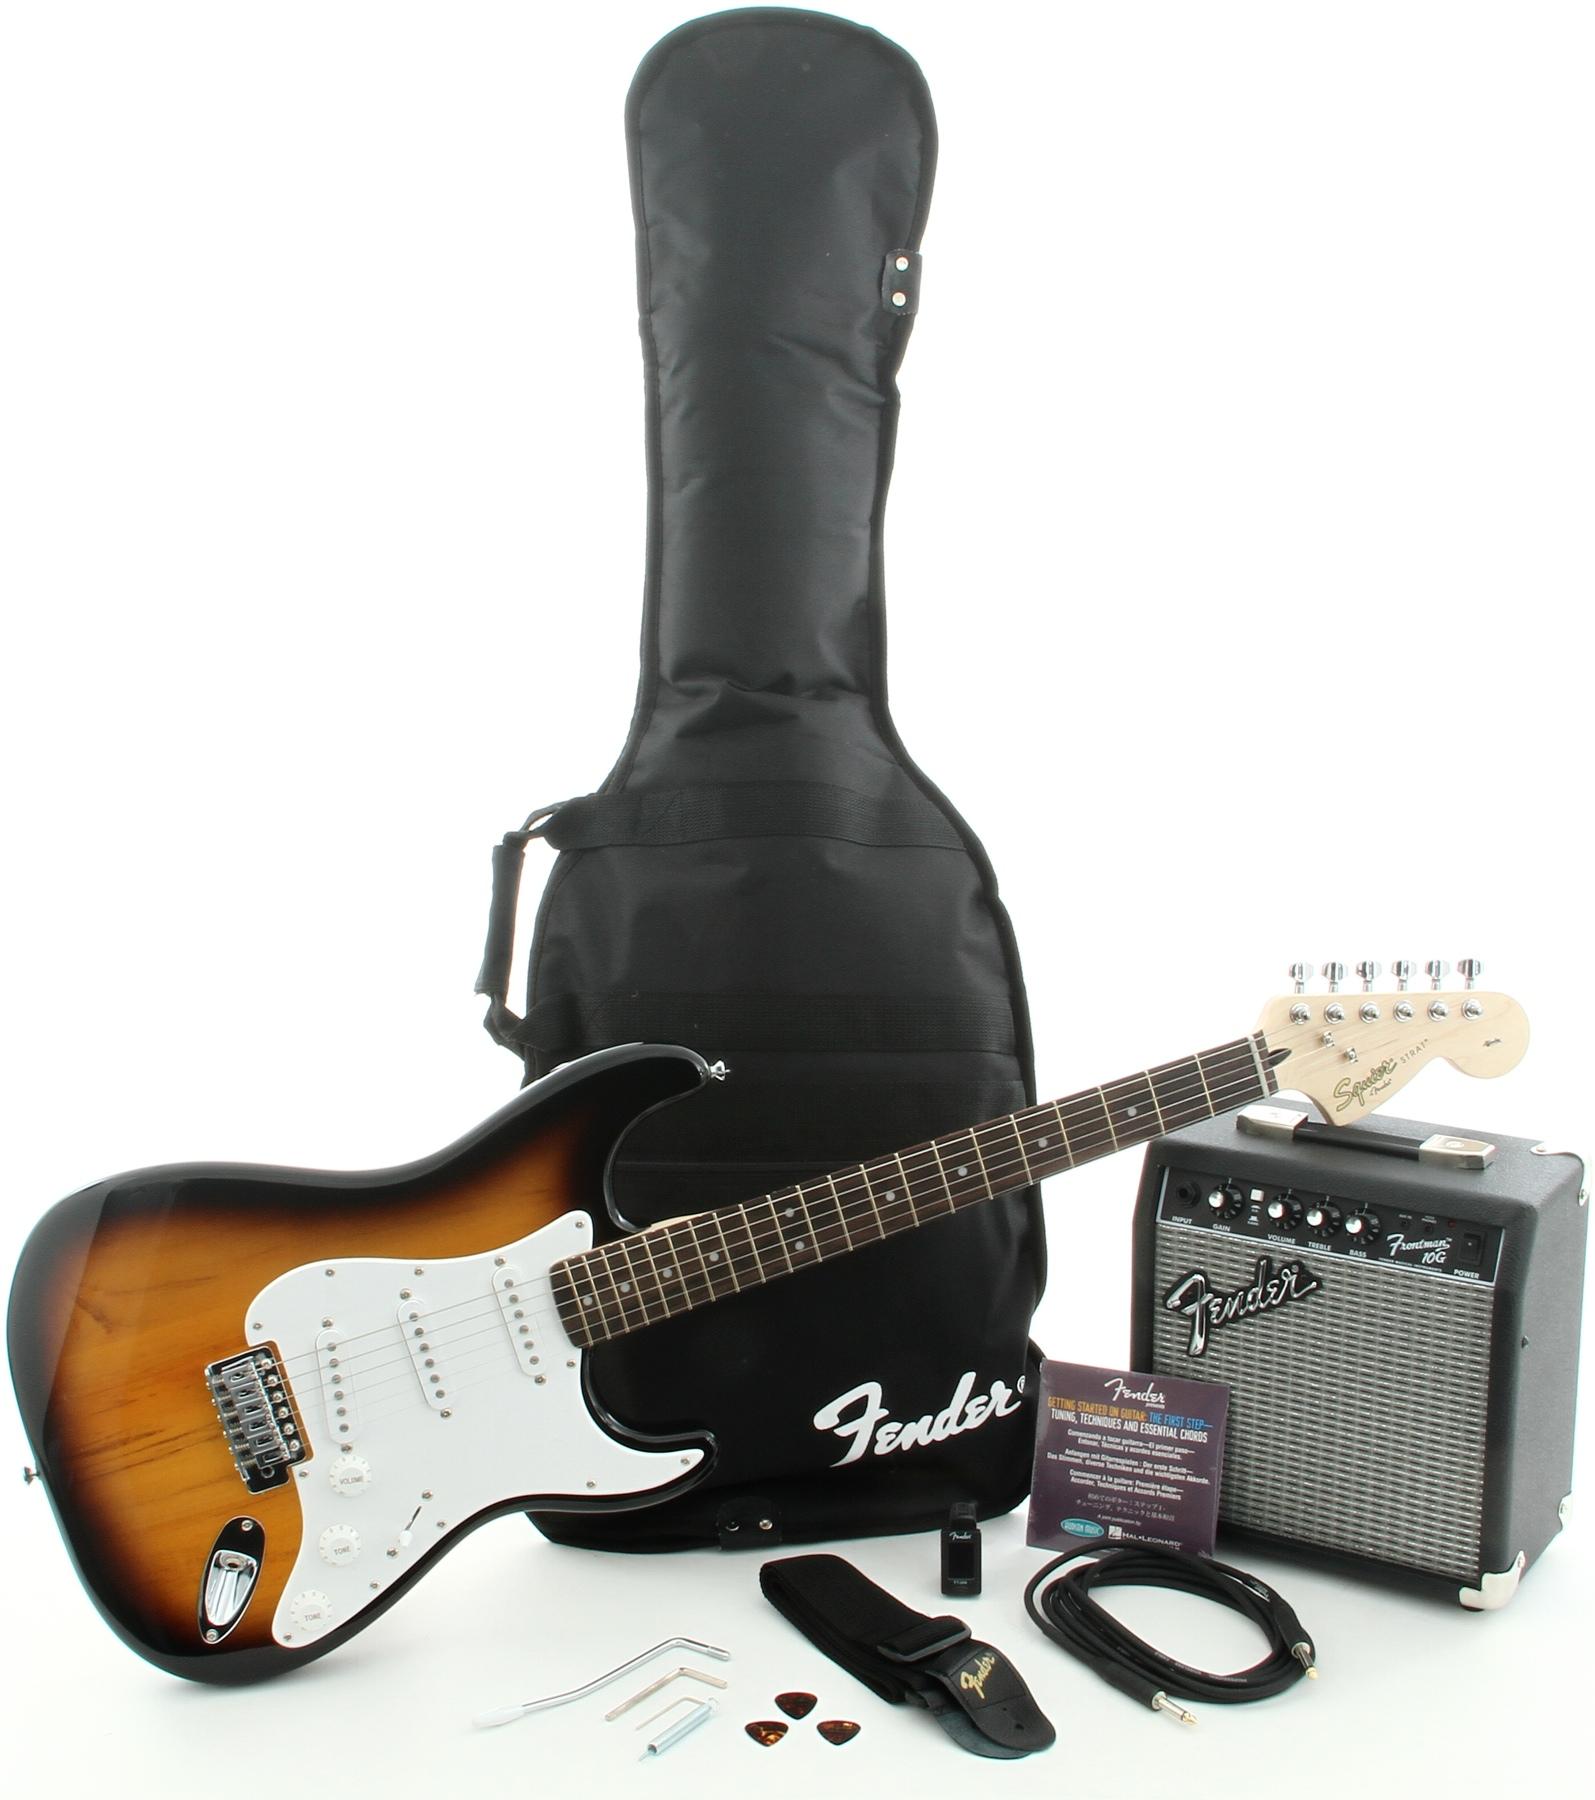 Squier - Pack Stratocaster Sunburst + Ampli Frontman 10G